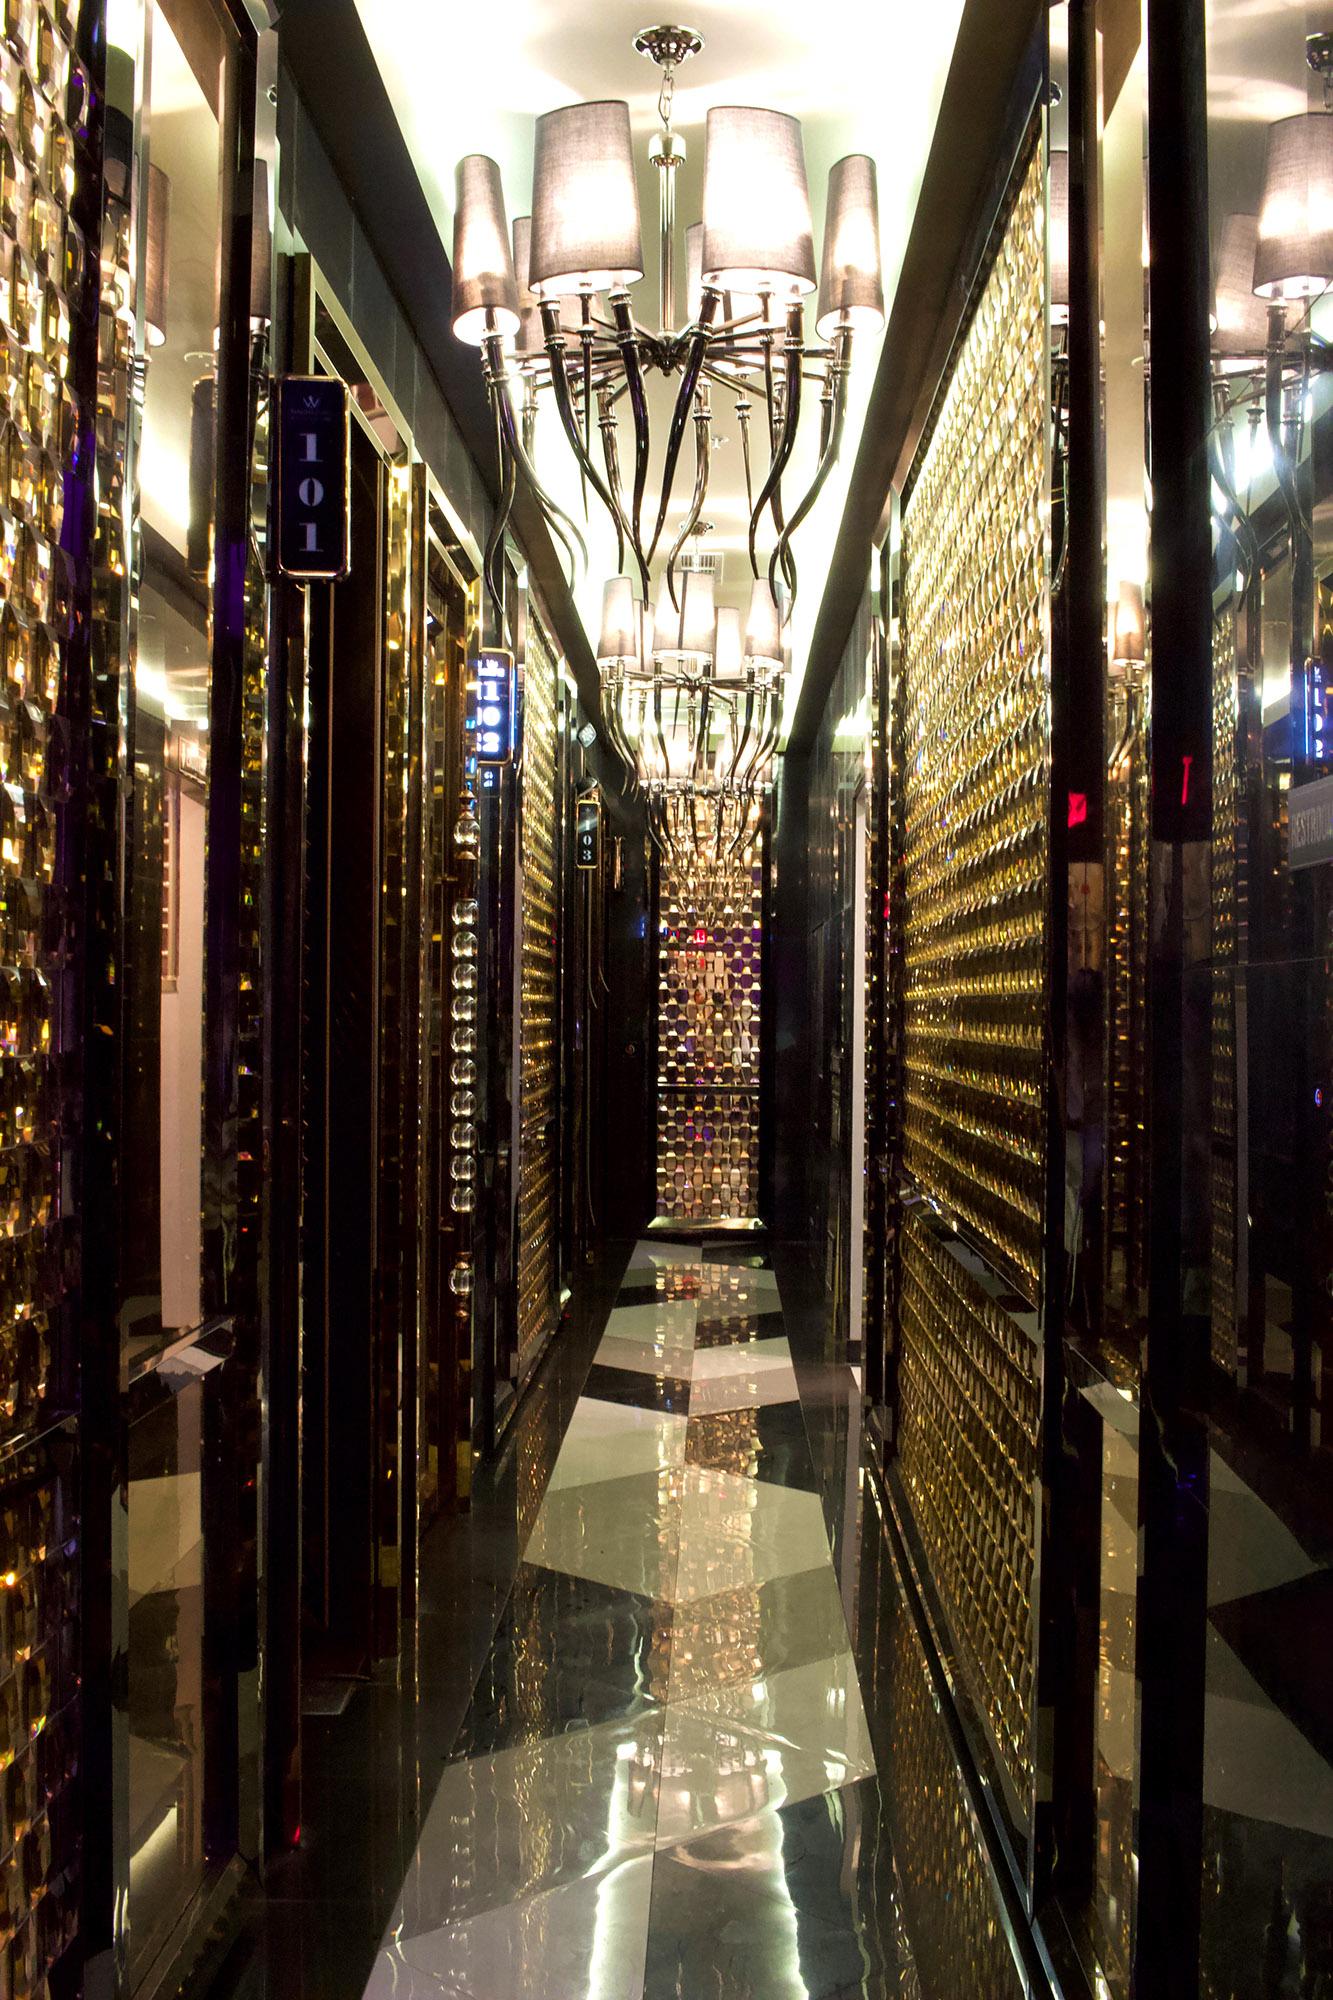 The W Karaoke Hallway